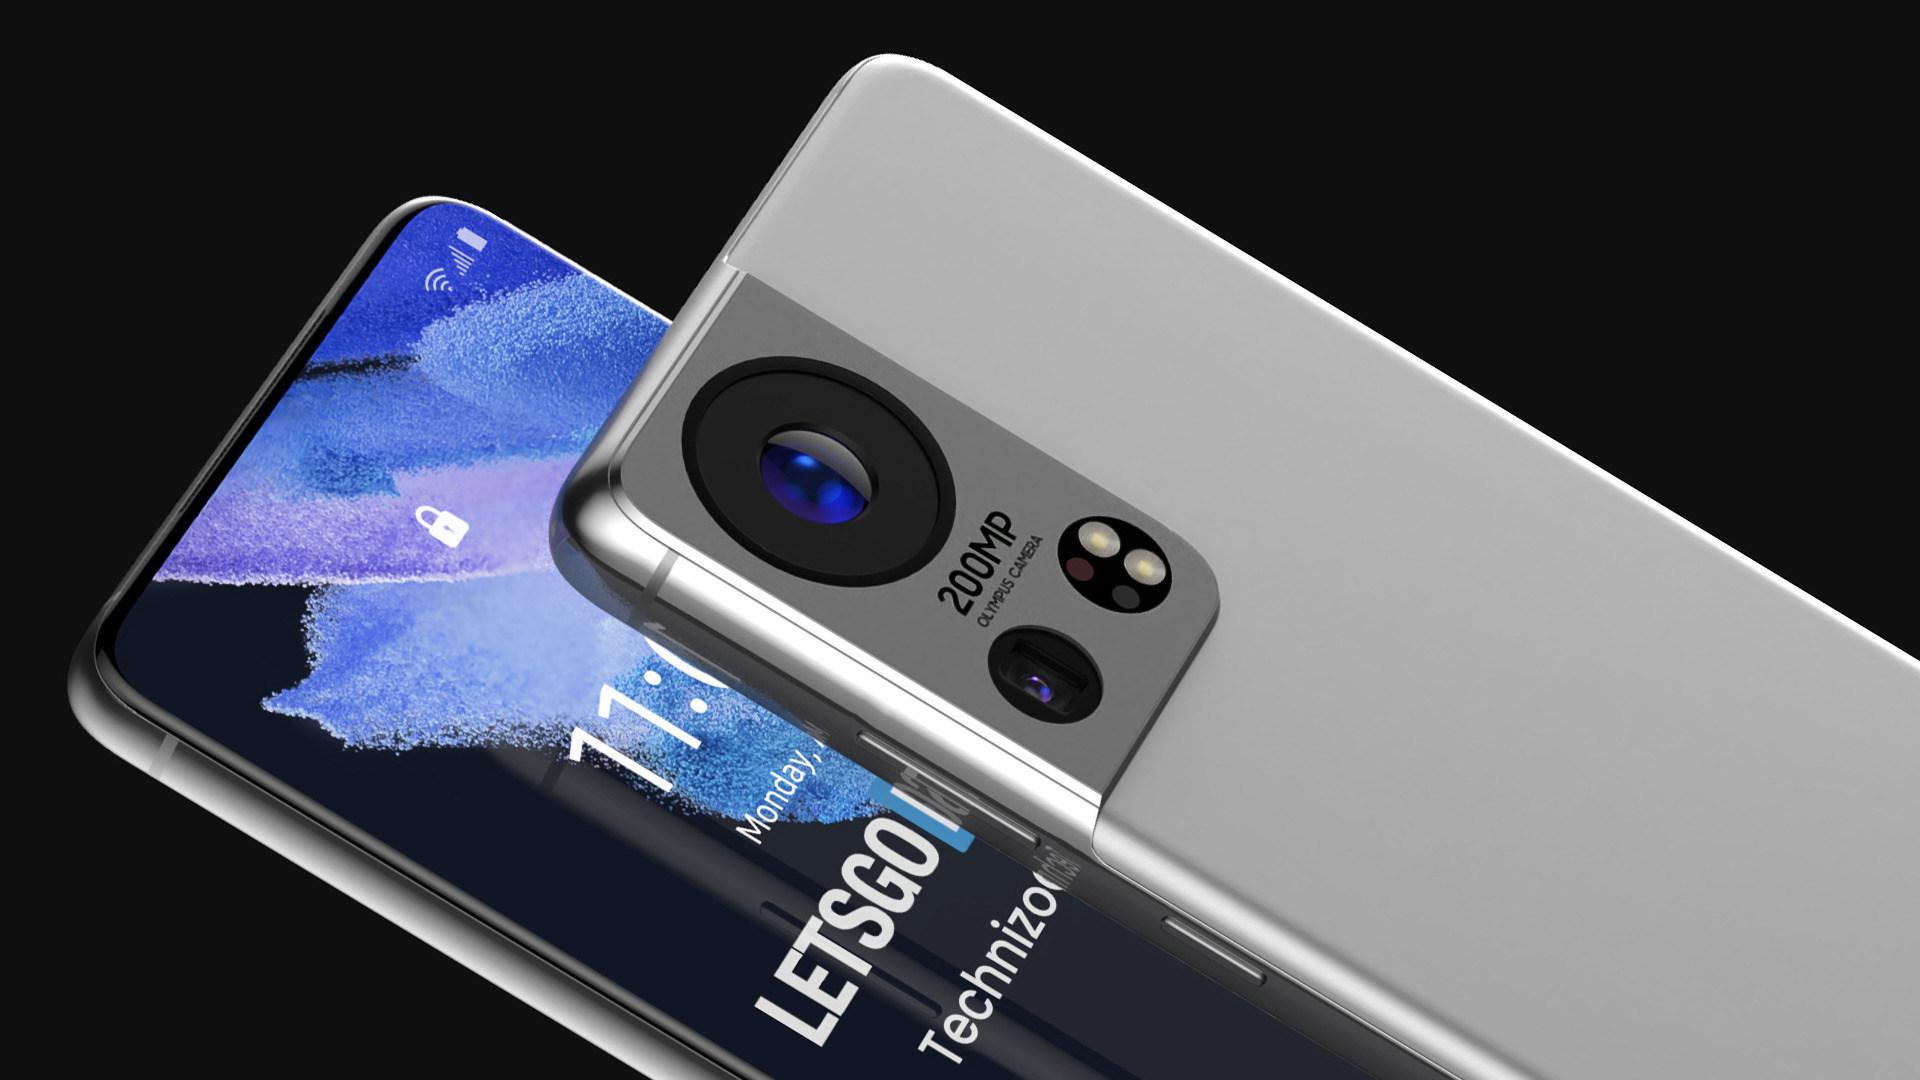 Samsung, Smartphones, Gerüchte, Leaks, Konzept, Renderbilder, Rendering, Olympus, galaxy S22, 200 Megapixel, 200 MP